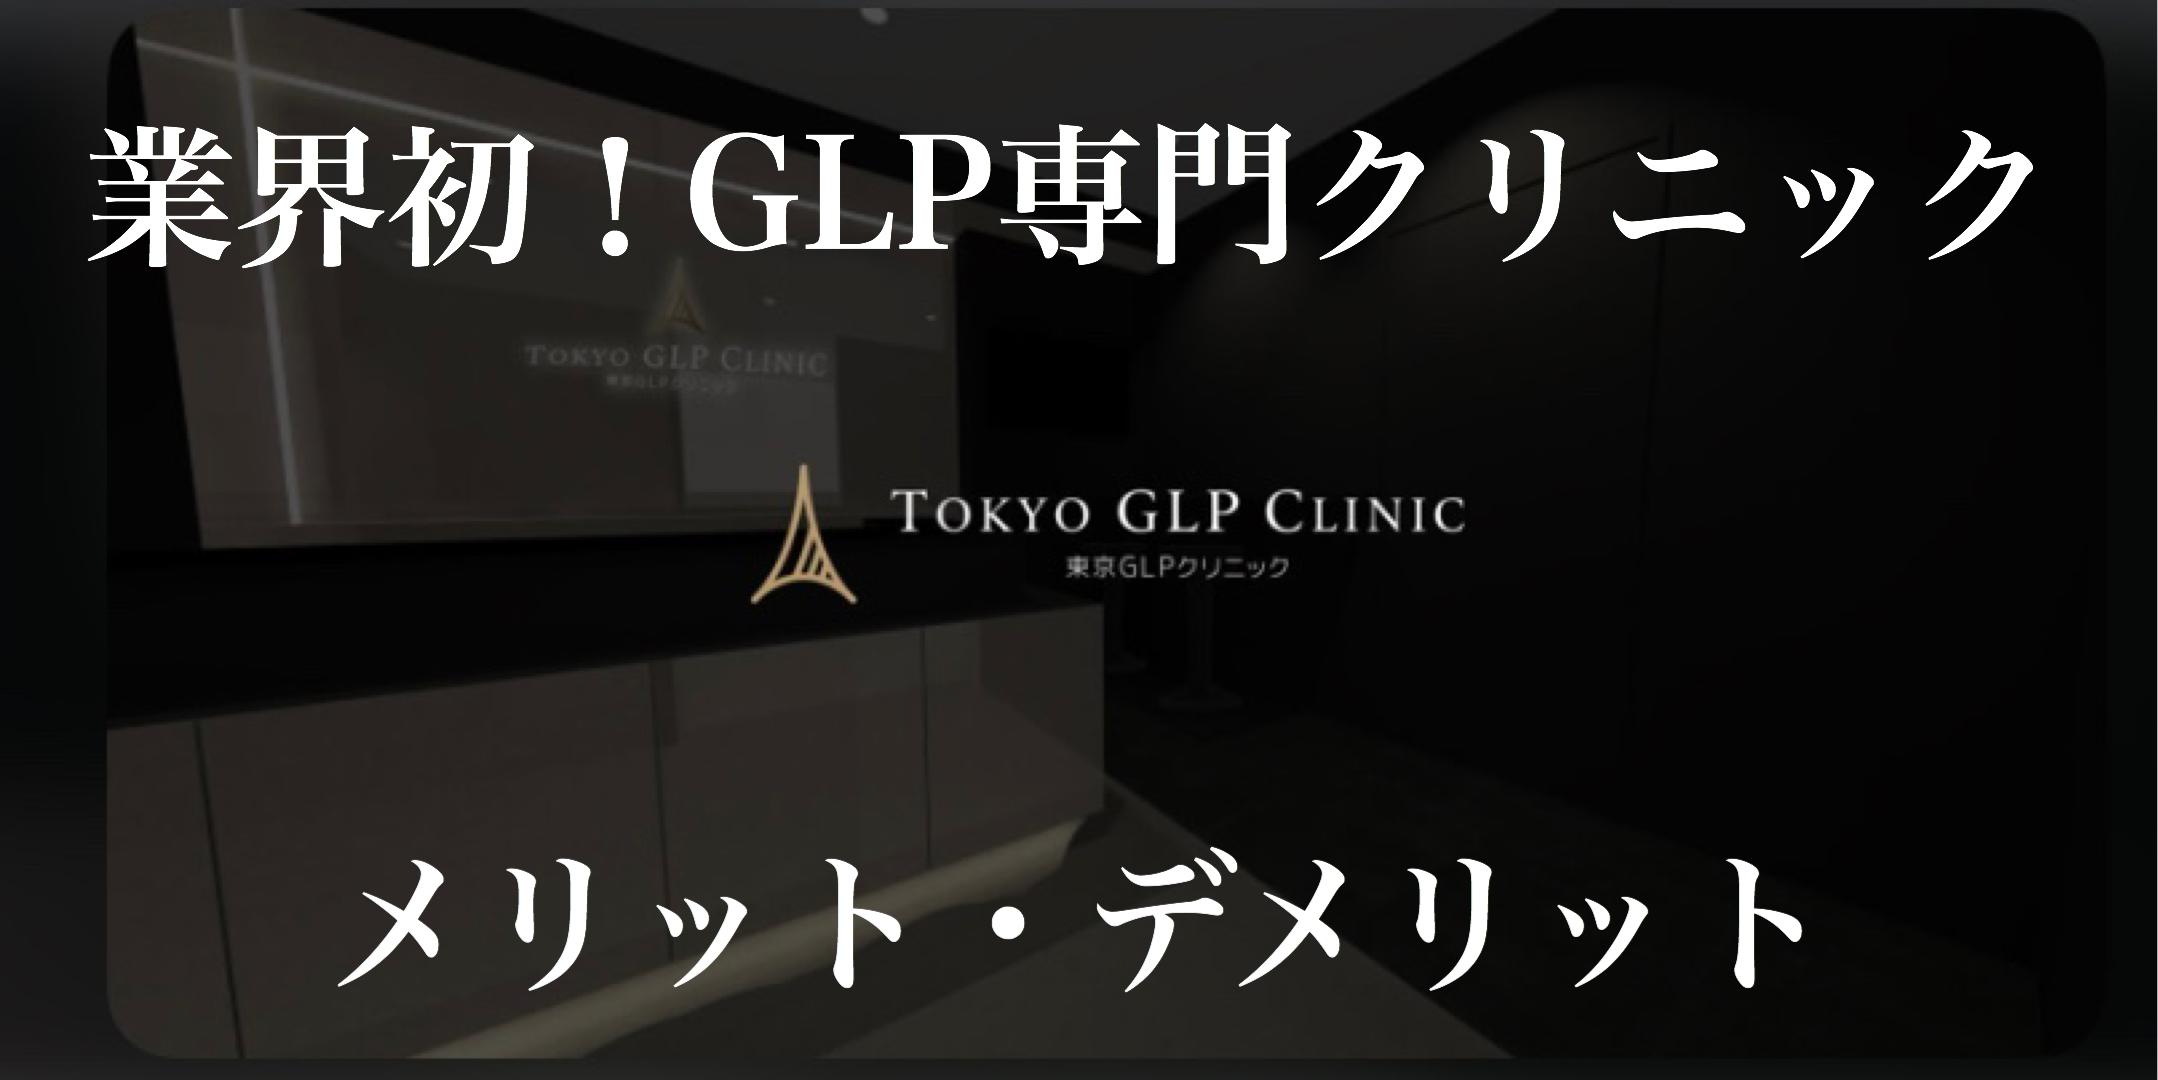 TOKYO GLP CLINIC メリット デメリット